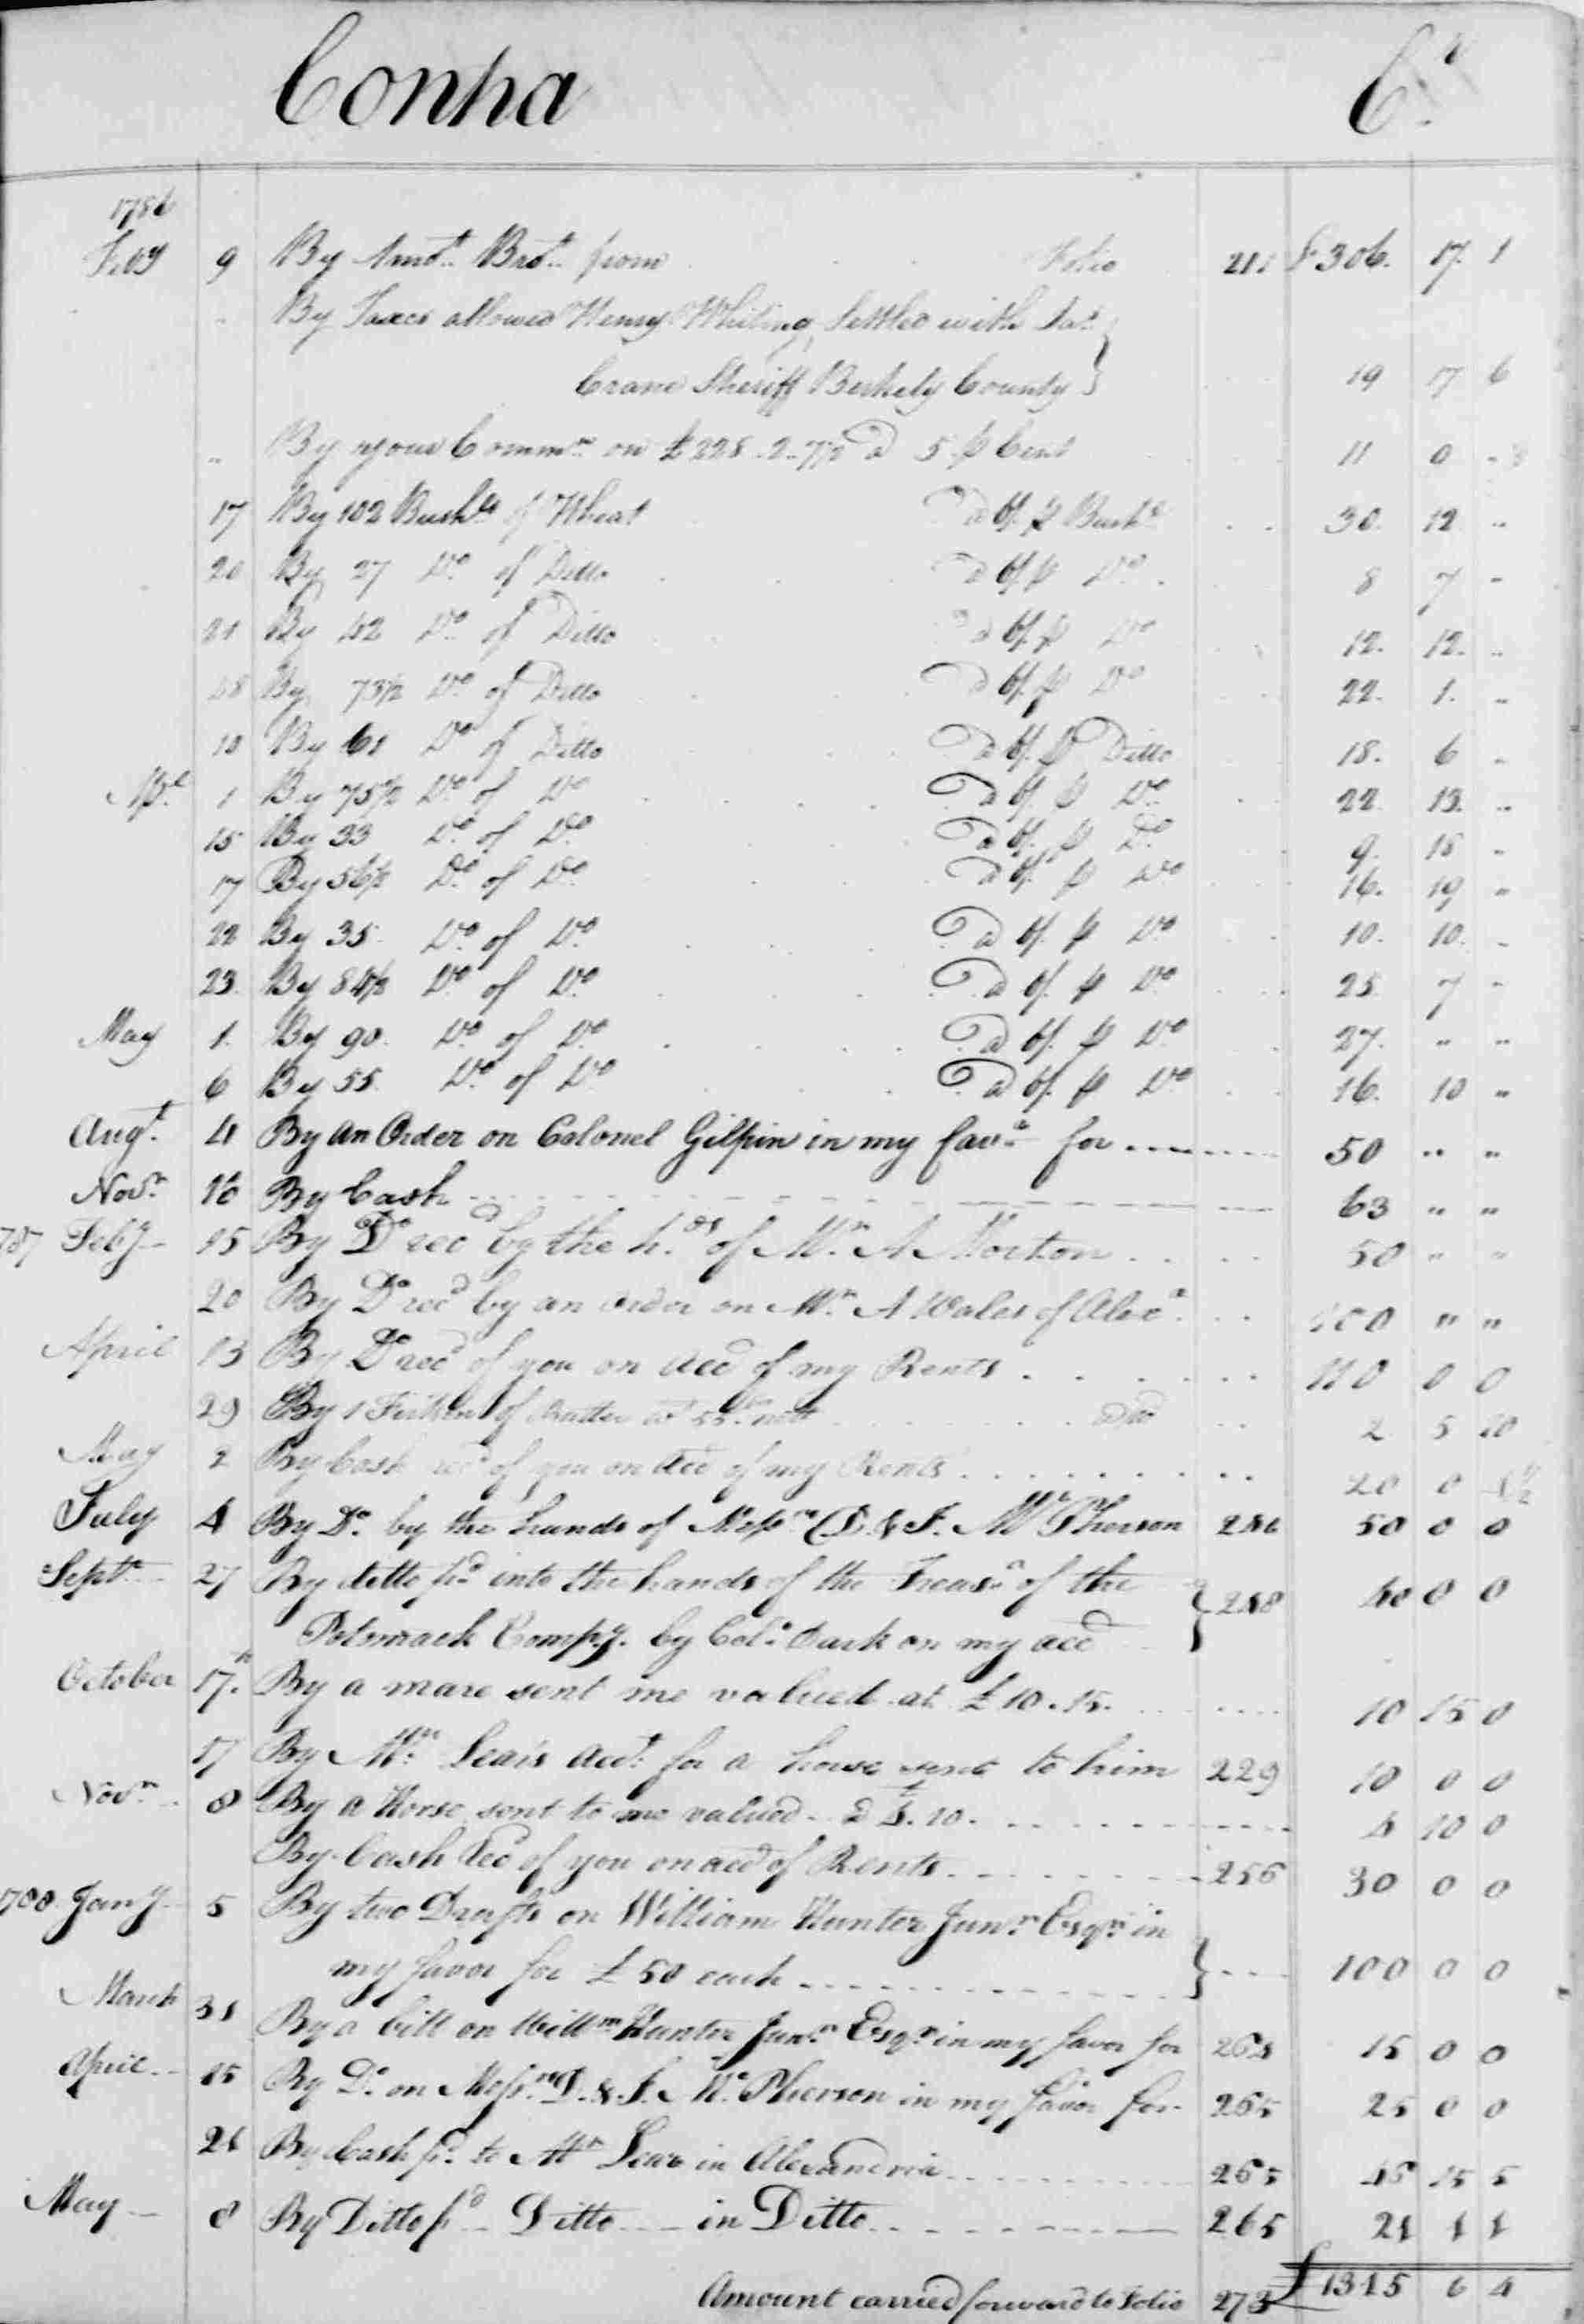 Ledger B, folio 213, right side